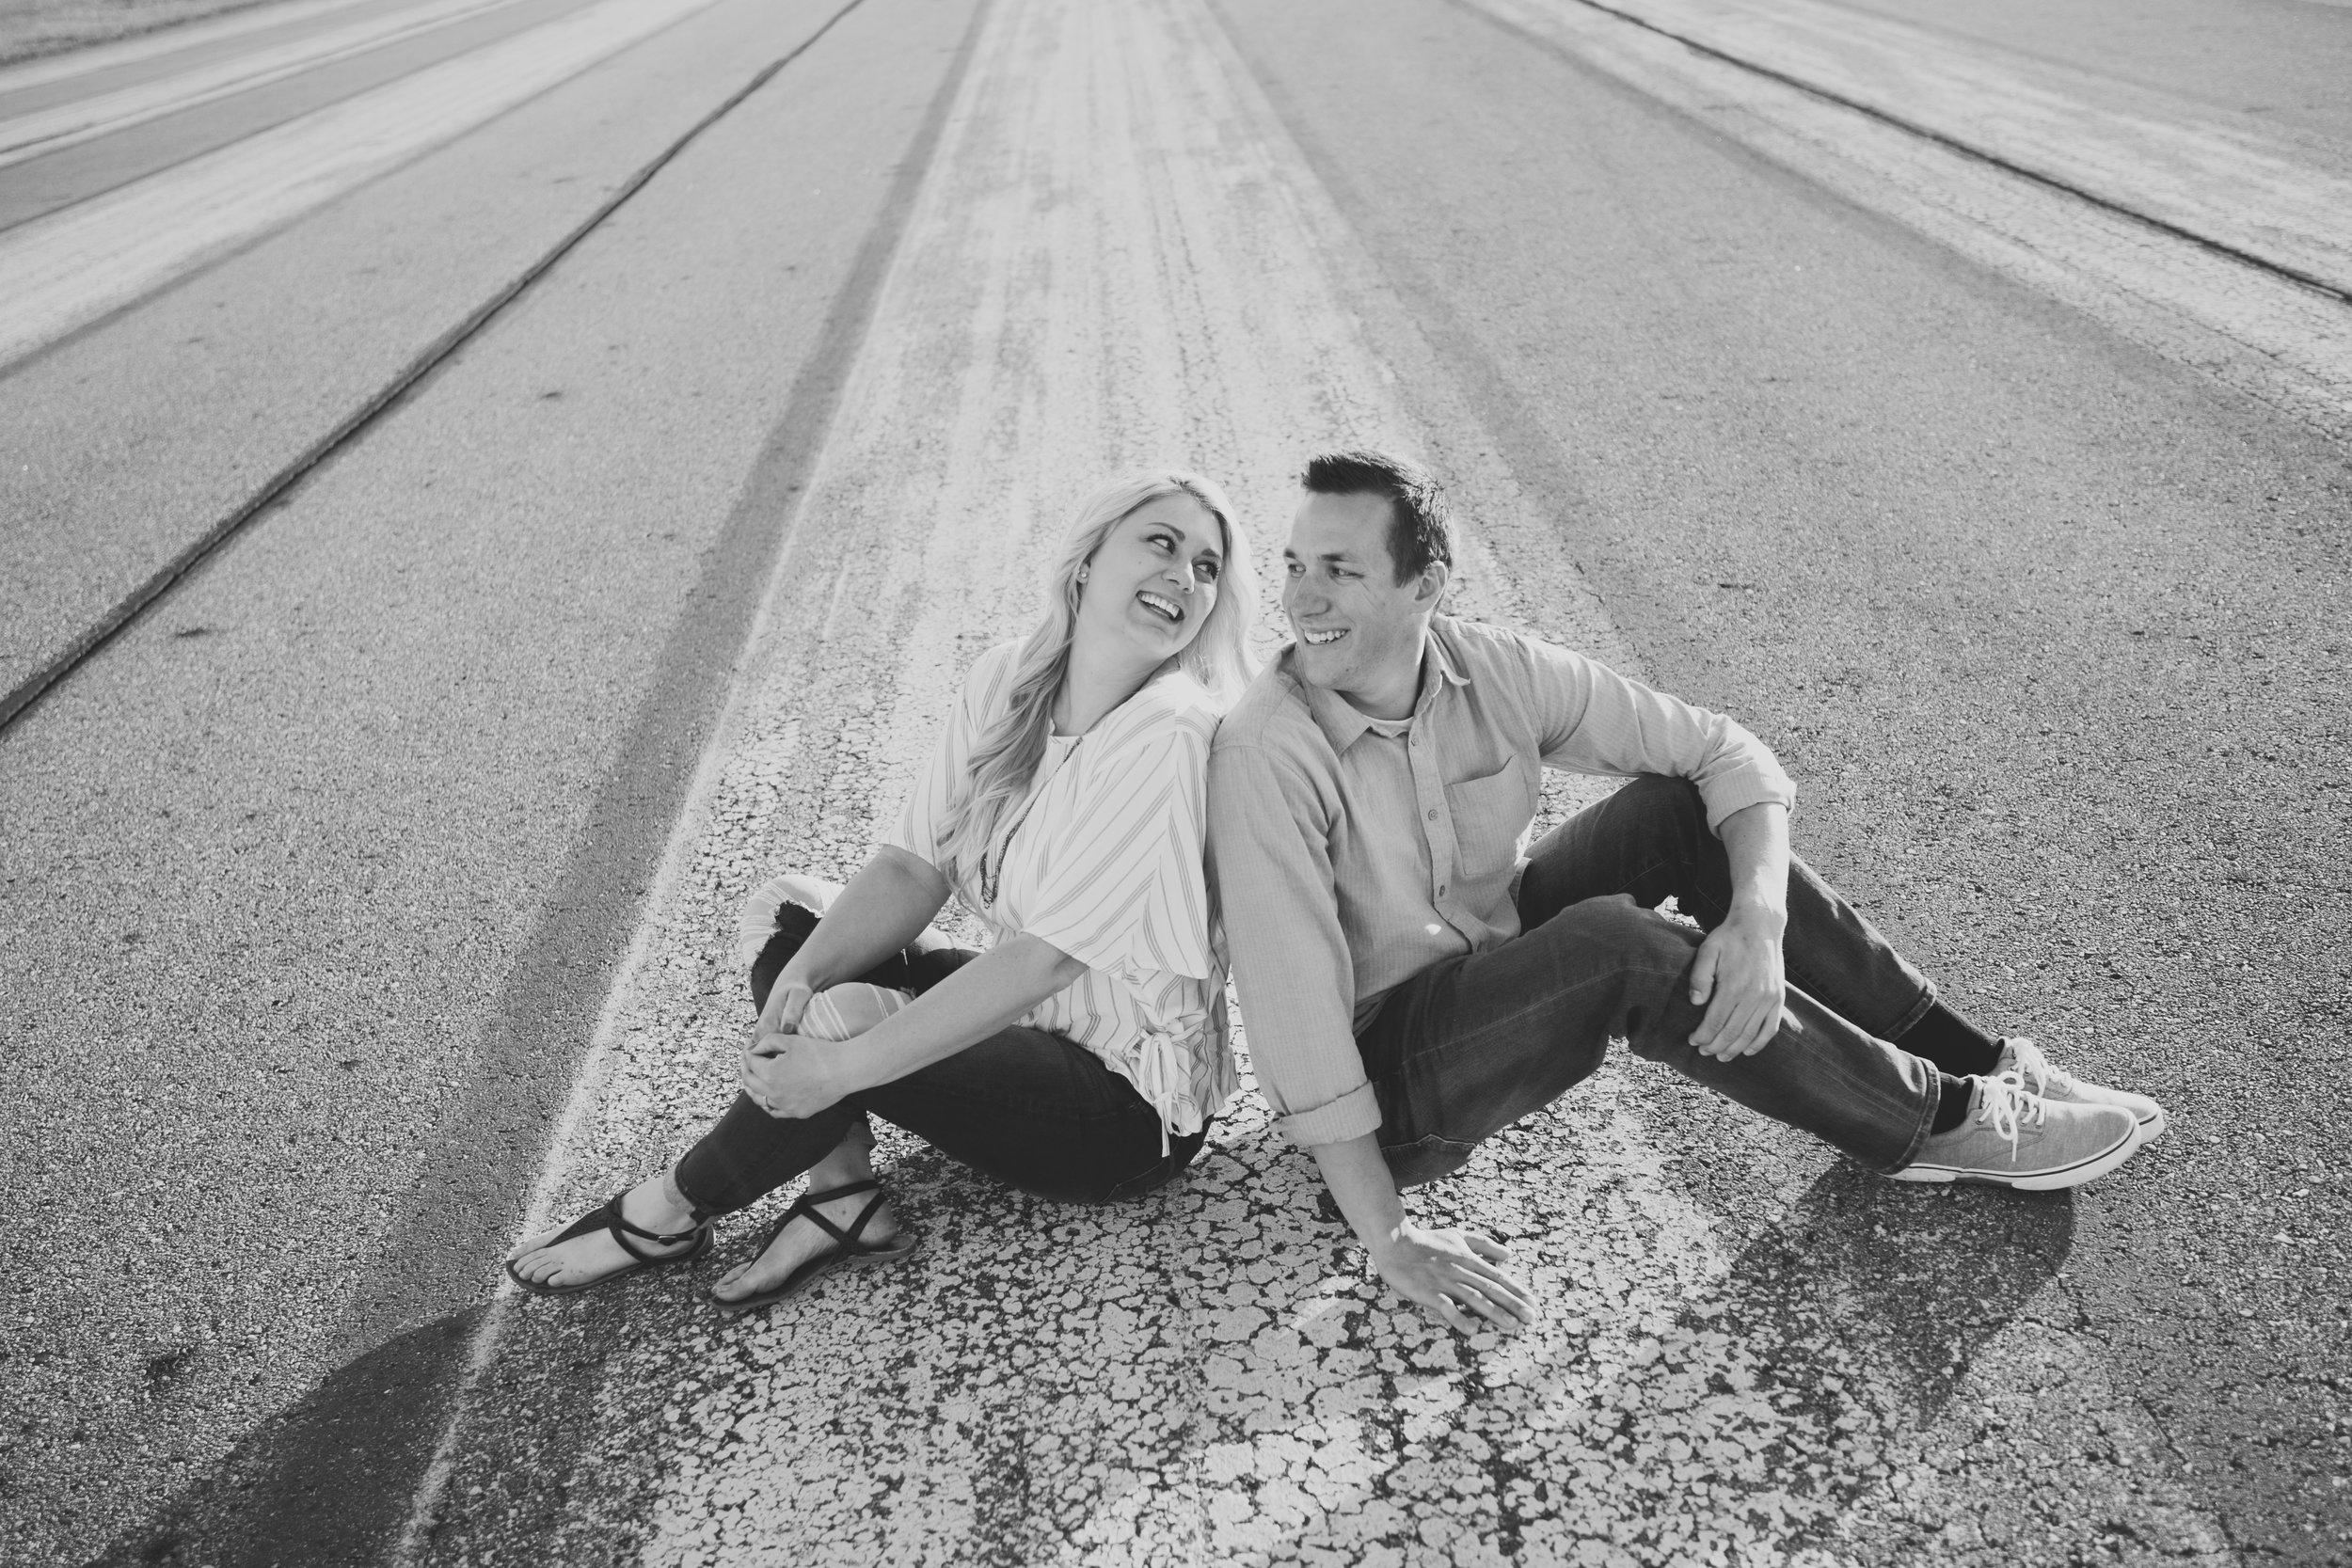 Grand Rapids Photographer - J Darling Photo - jessica darling - grand rapids wedding photographer - sparta airport - sparta michigan - jasmine and jeff engaged 041.jpg